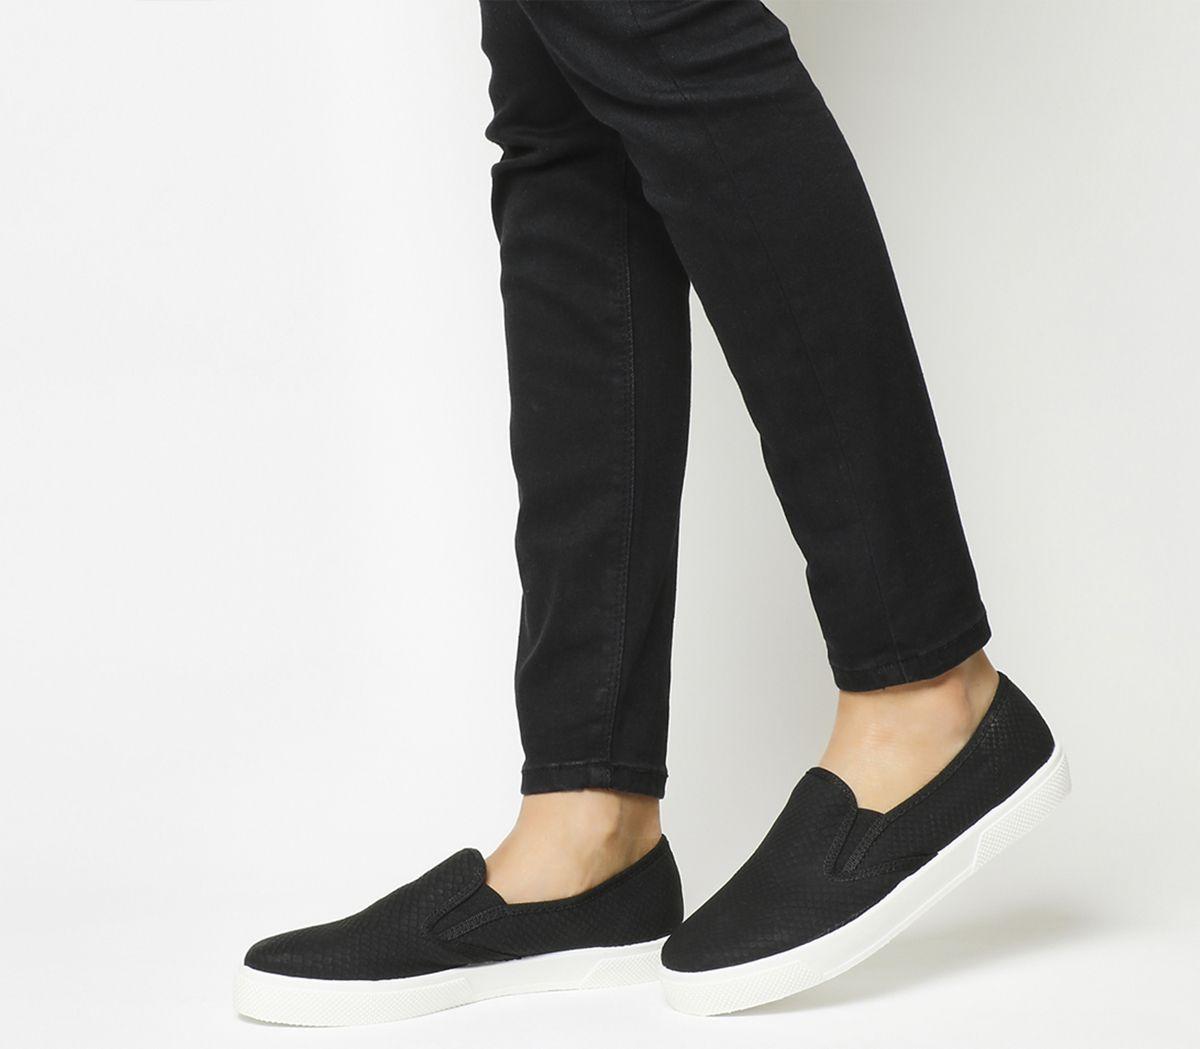 952d14d62542 Office Kicker Slip On Shoes Black Snake - Flats